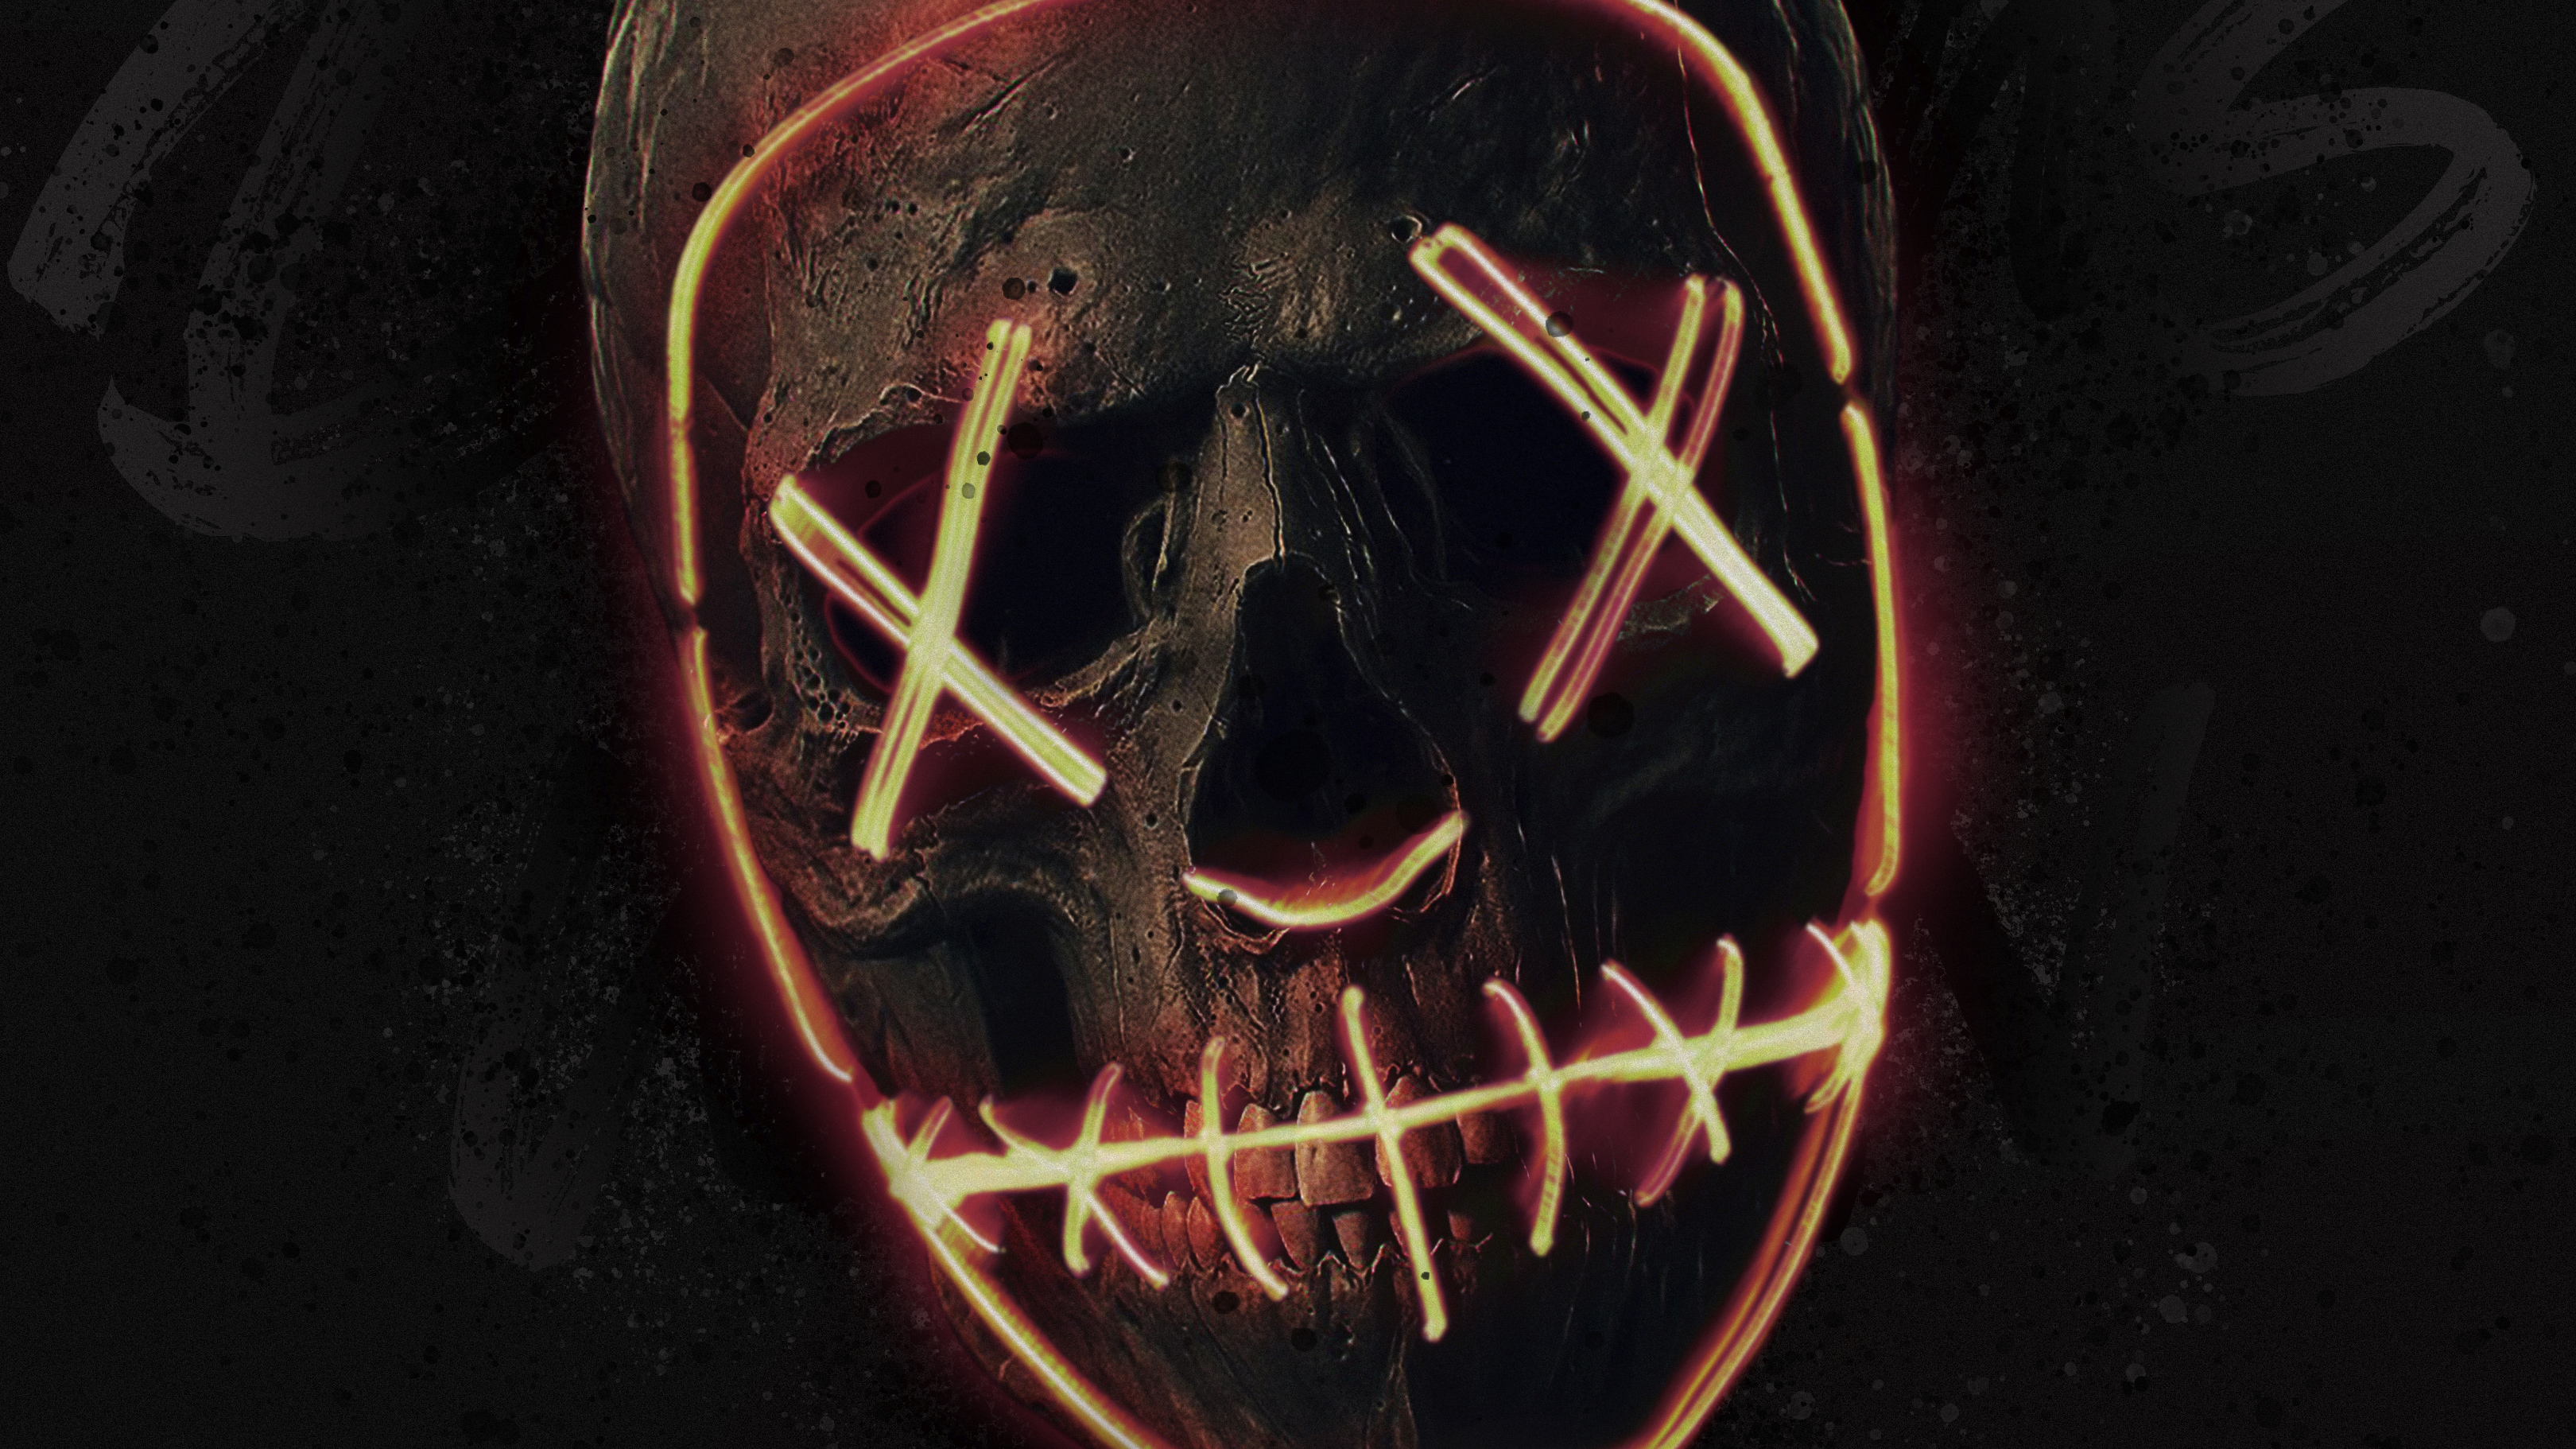 Skull Neon Mask Hd Artist 4k Wallpapers Images